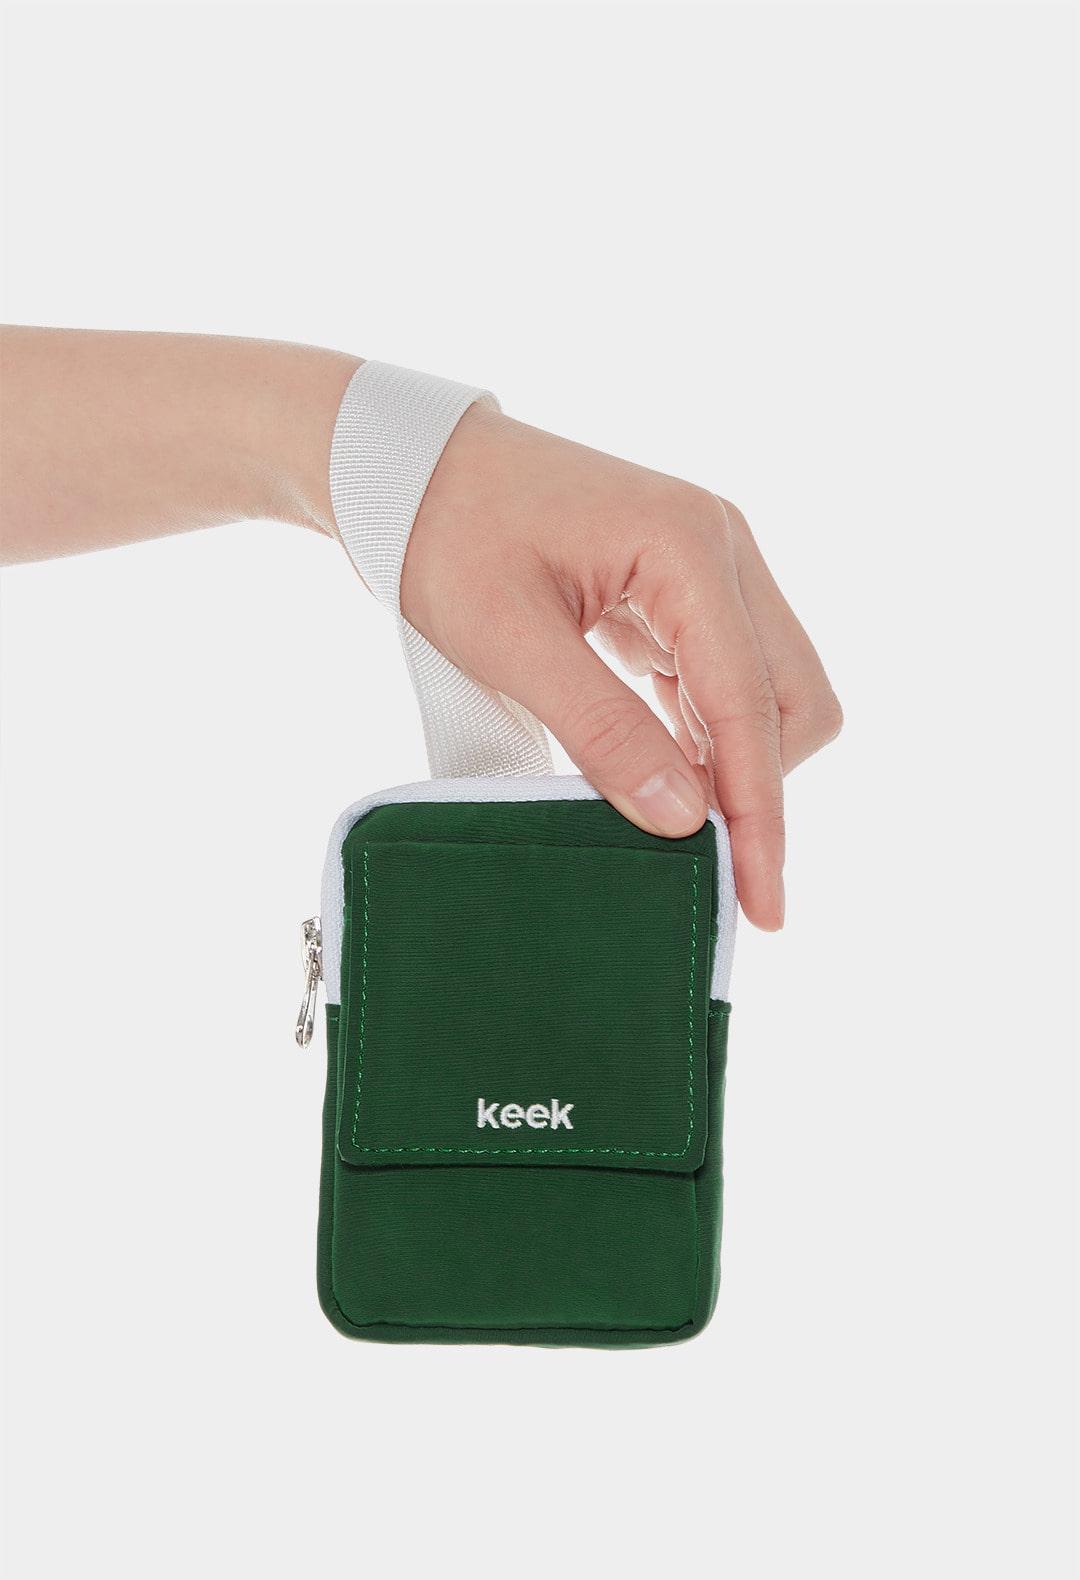 keek Buckle Pocket - Green 스트릿패션 유니섹스브랜드 커플시밀러룩 남자쇼핑몰 여성의류쇼핑몰 후드티 힙색